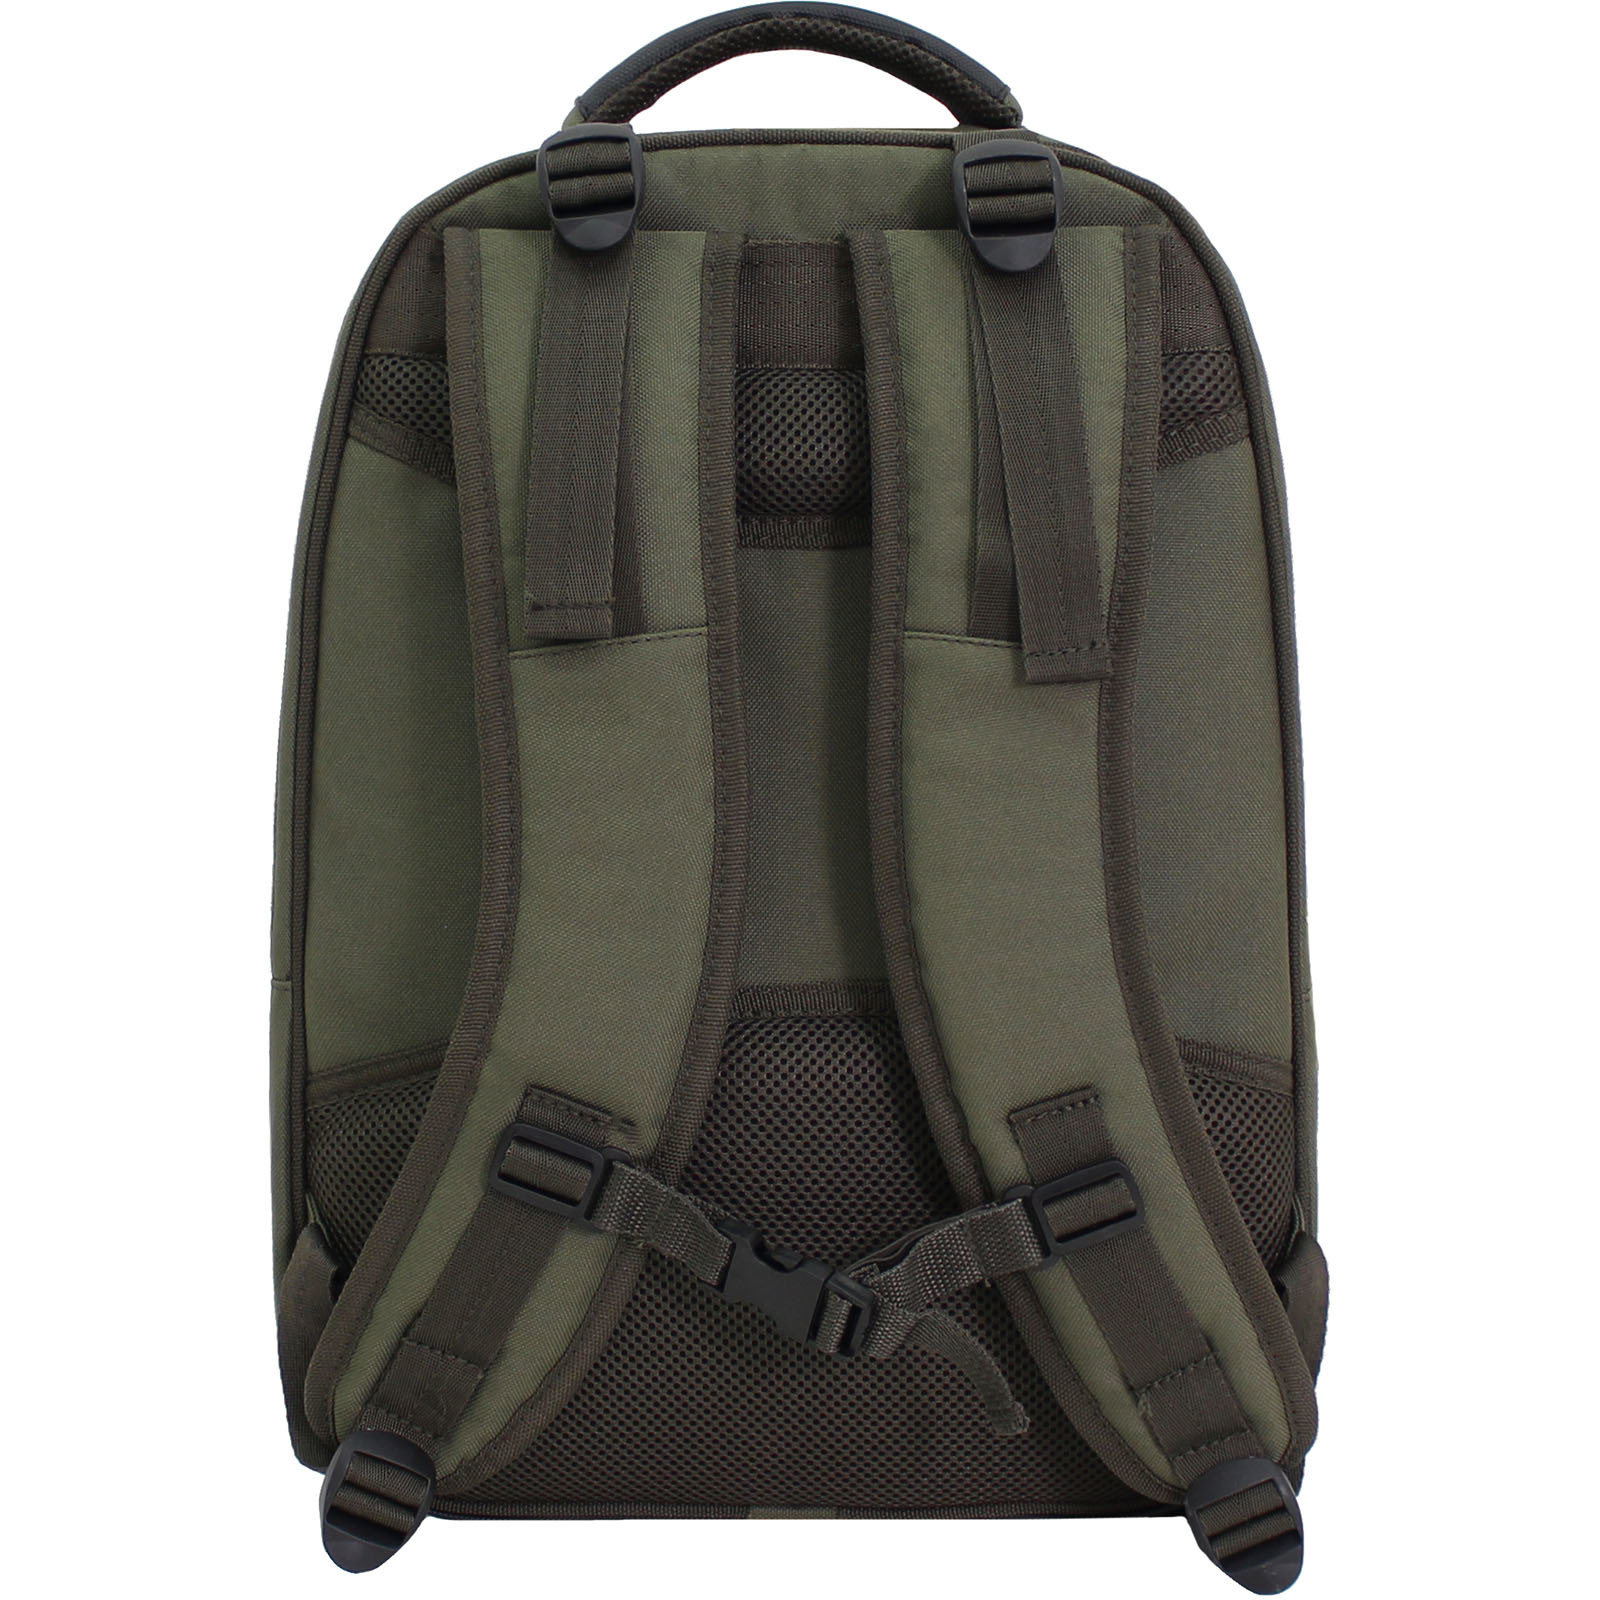 Рюкзак для ноутбука Bagland Рюкзак под ноутбук 536 22 л. Хаки (0053666) фото 3